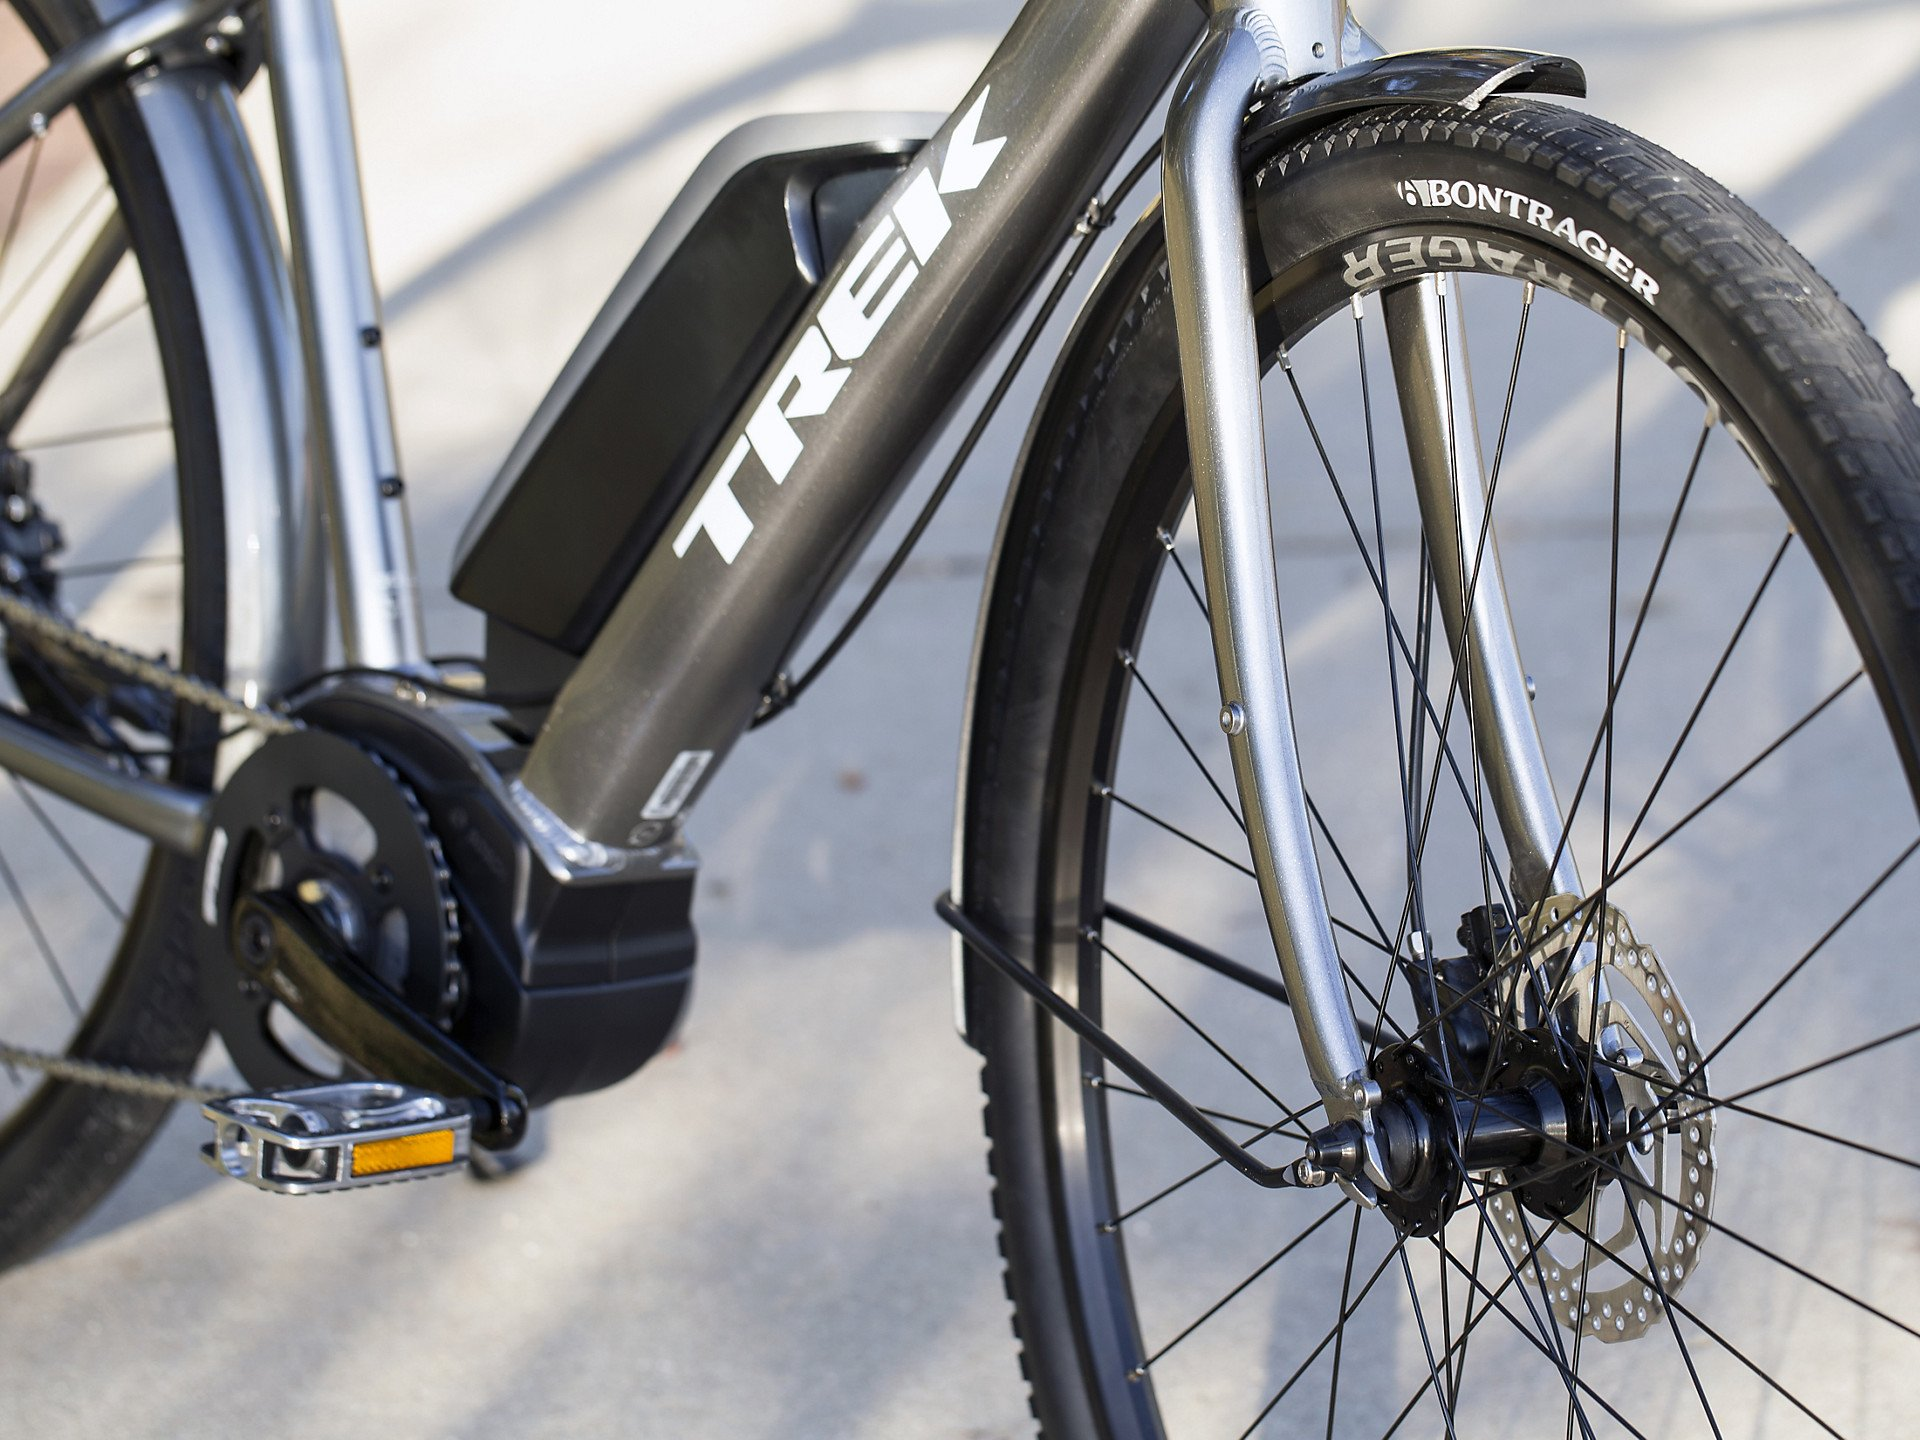 Trek Verve Lowstep Electric Bike 2019 Roe Valley Cycles